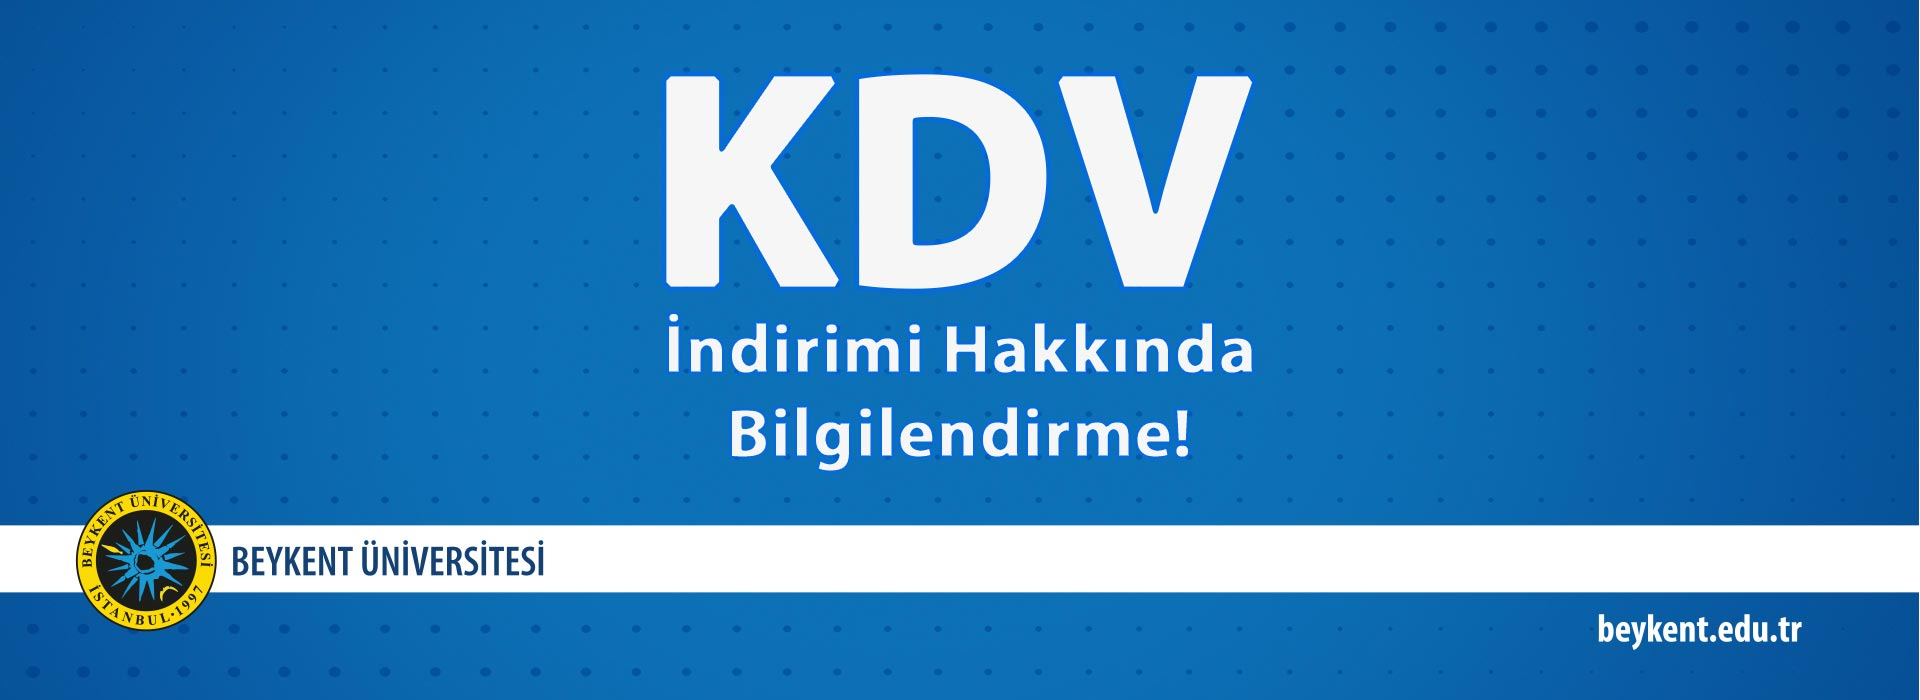 kdv-indirimi-1920-700